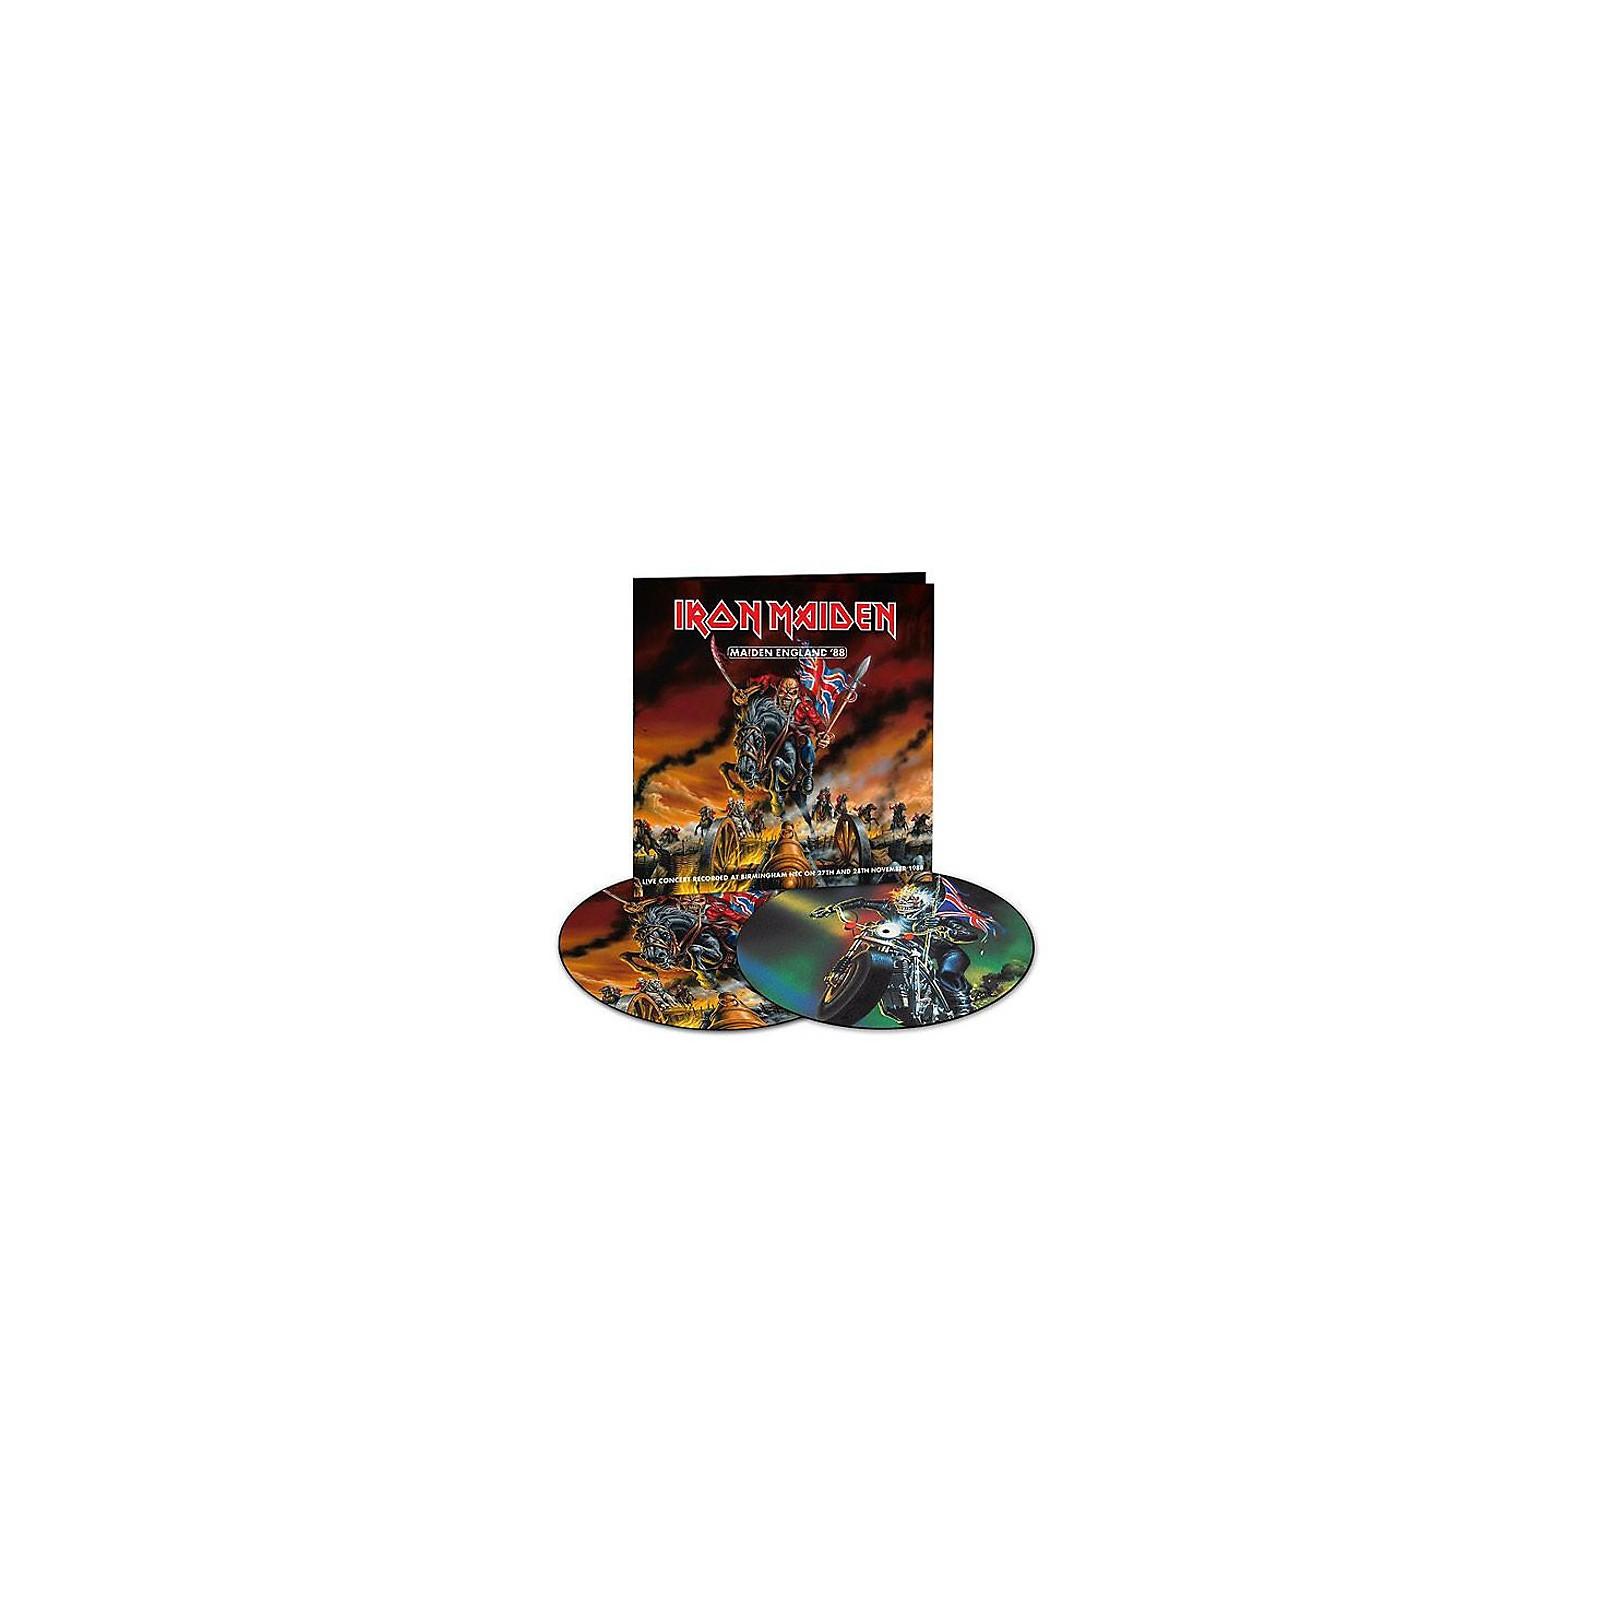 Alliance Iron Maiden - Maiden England: Live